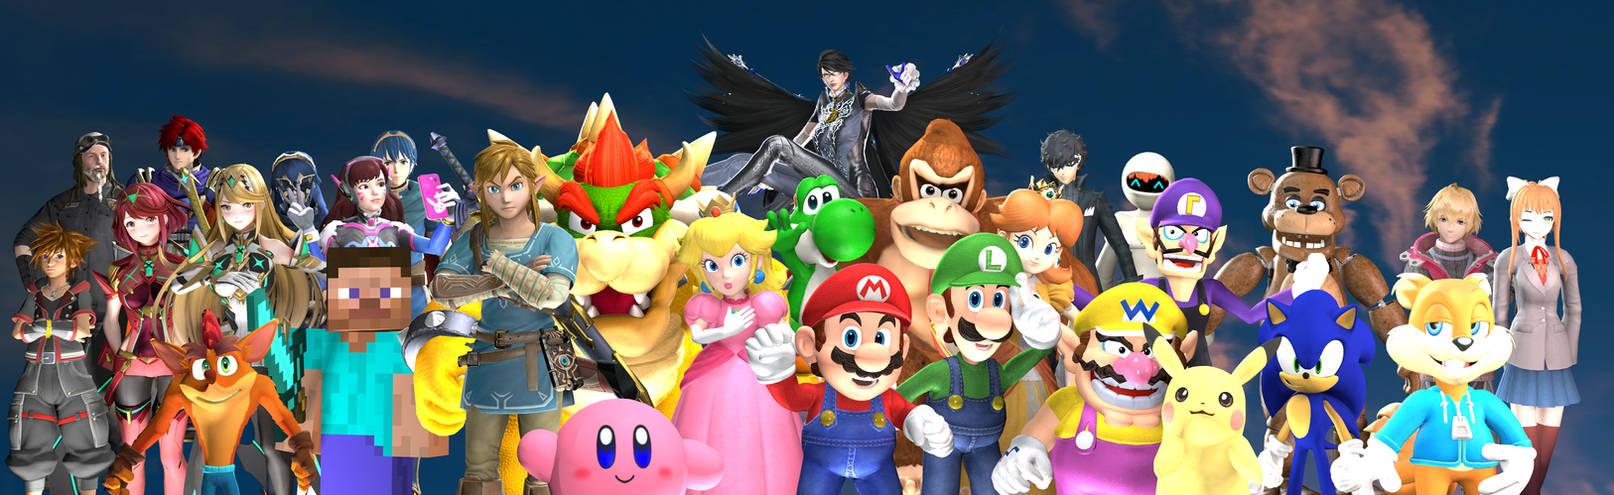 (SFM) Gaming All-Stars Unite